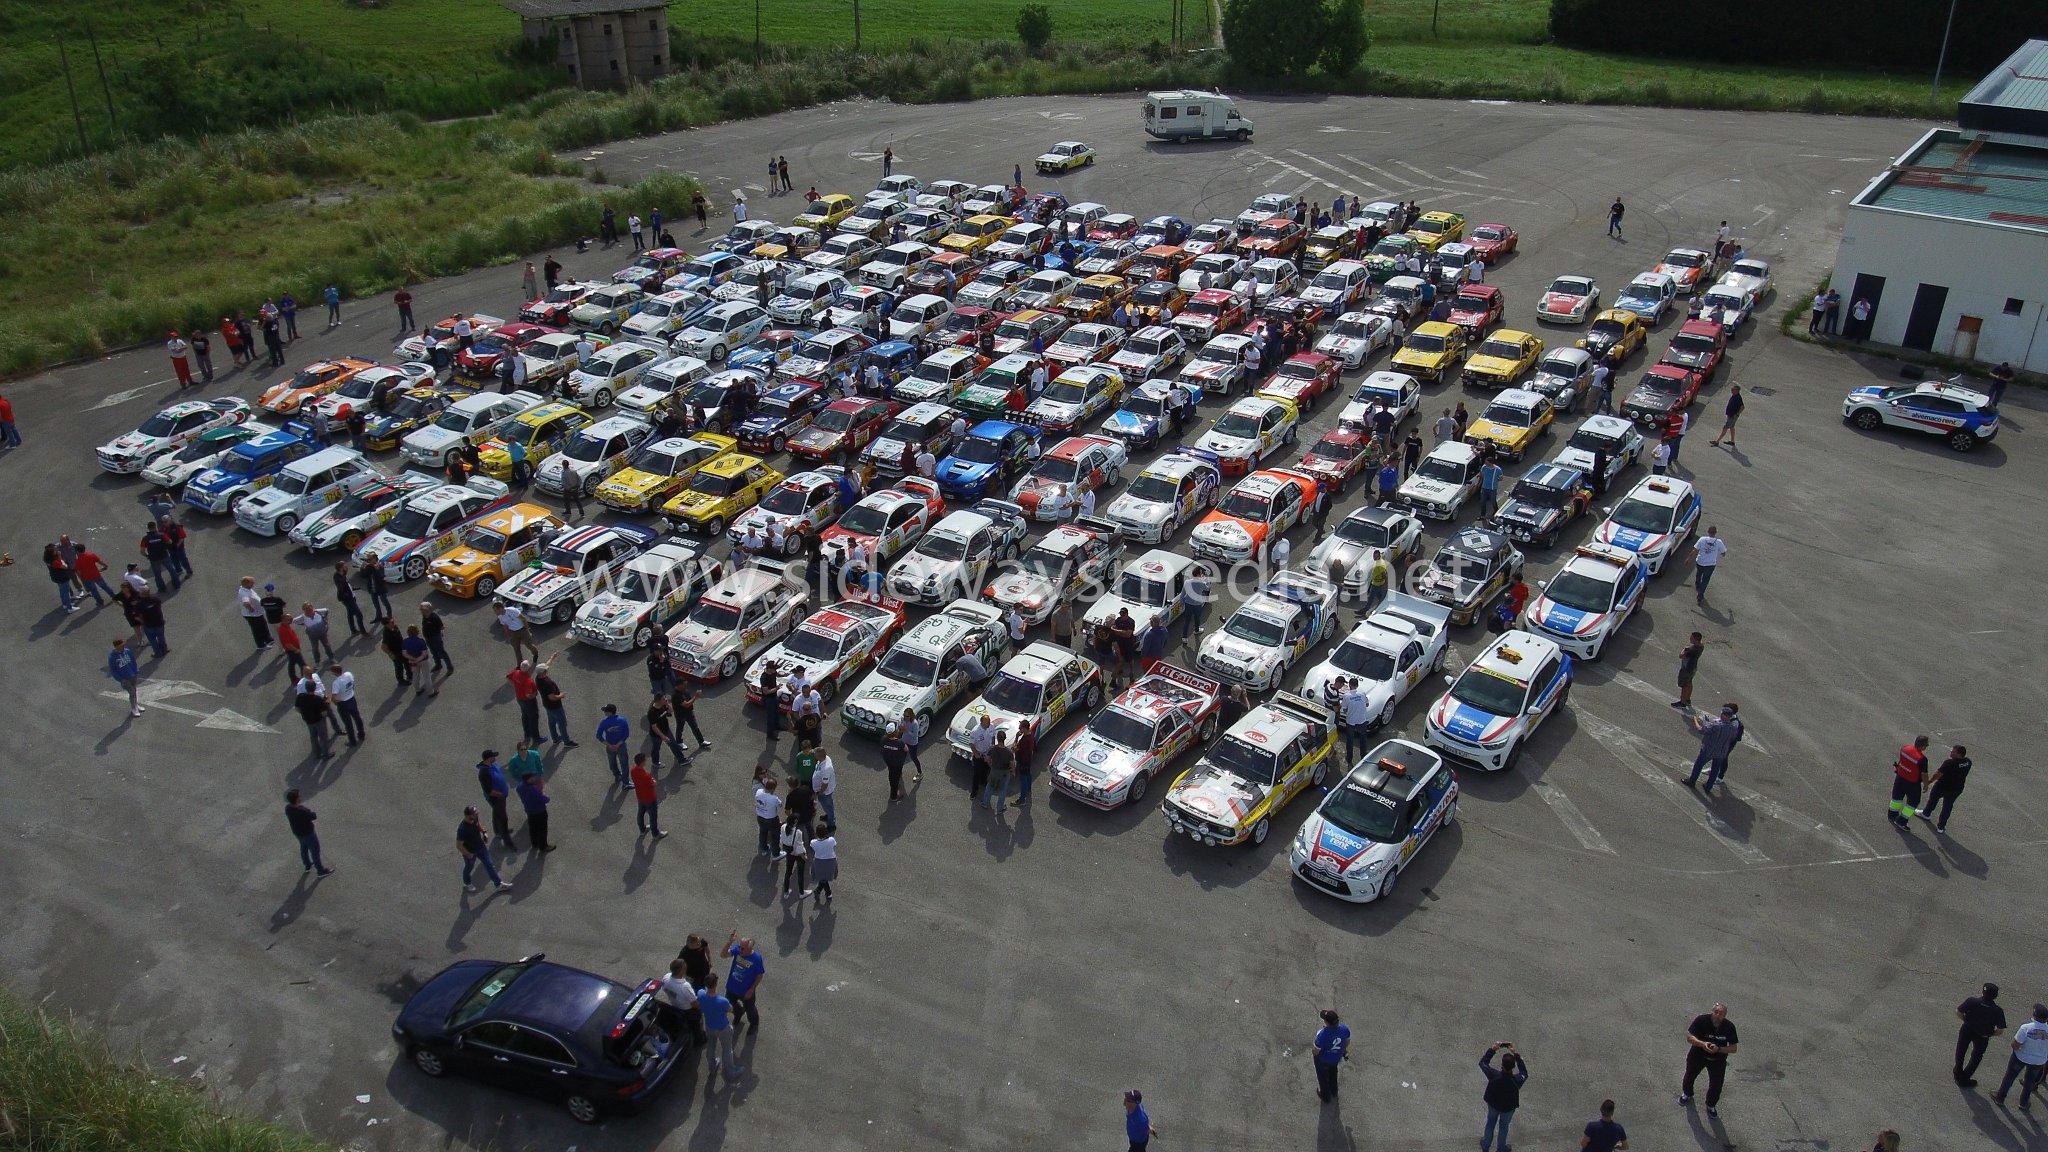 6º Rallye Festival Trasmiera [10-11-12 Mayo] - Página 10 DdJ3MHPWAAA-w99